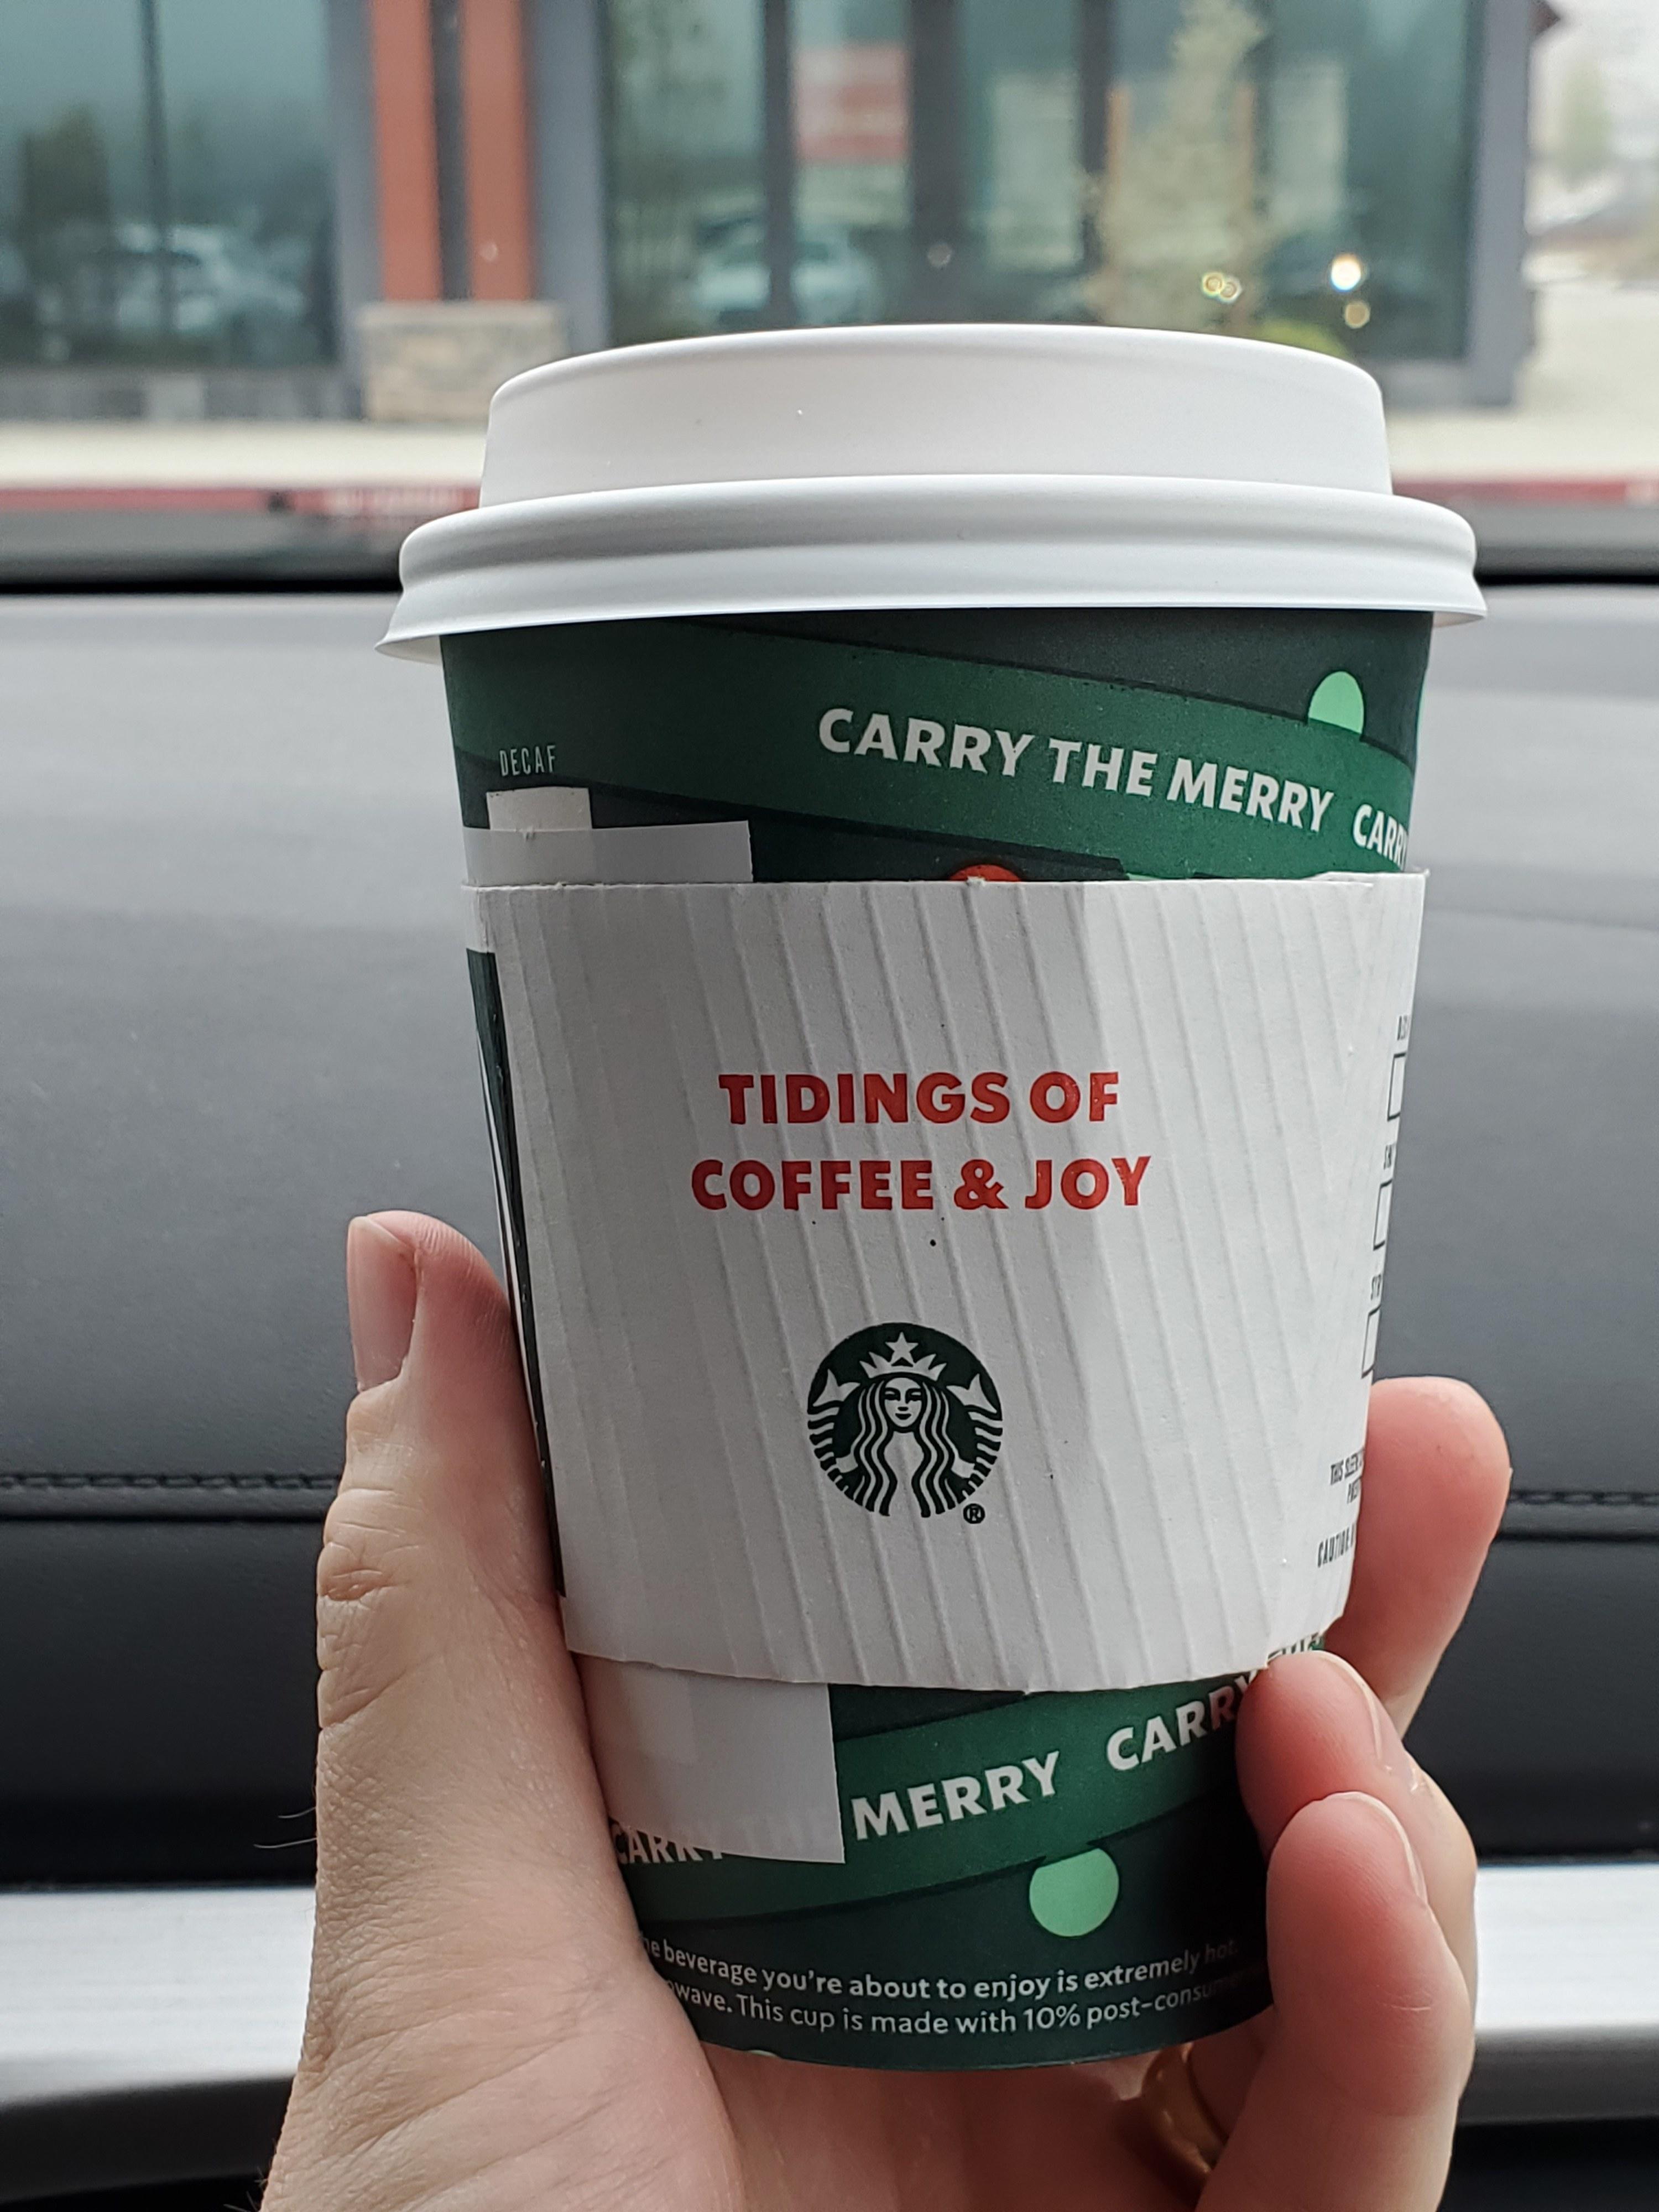 A Christmas-themed Starbucks cup